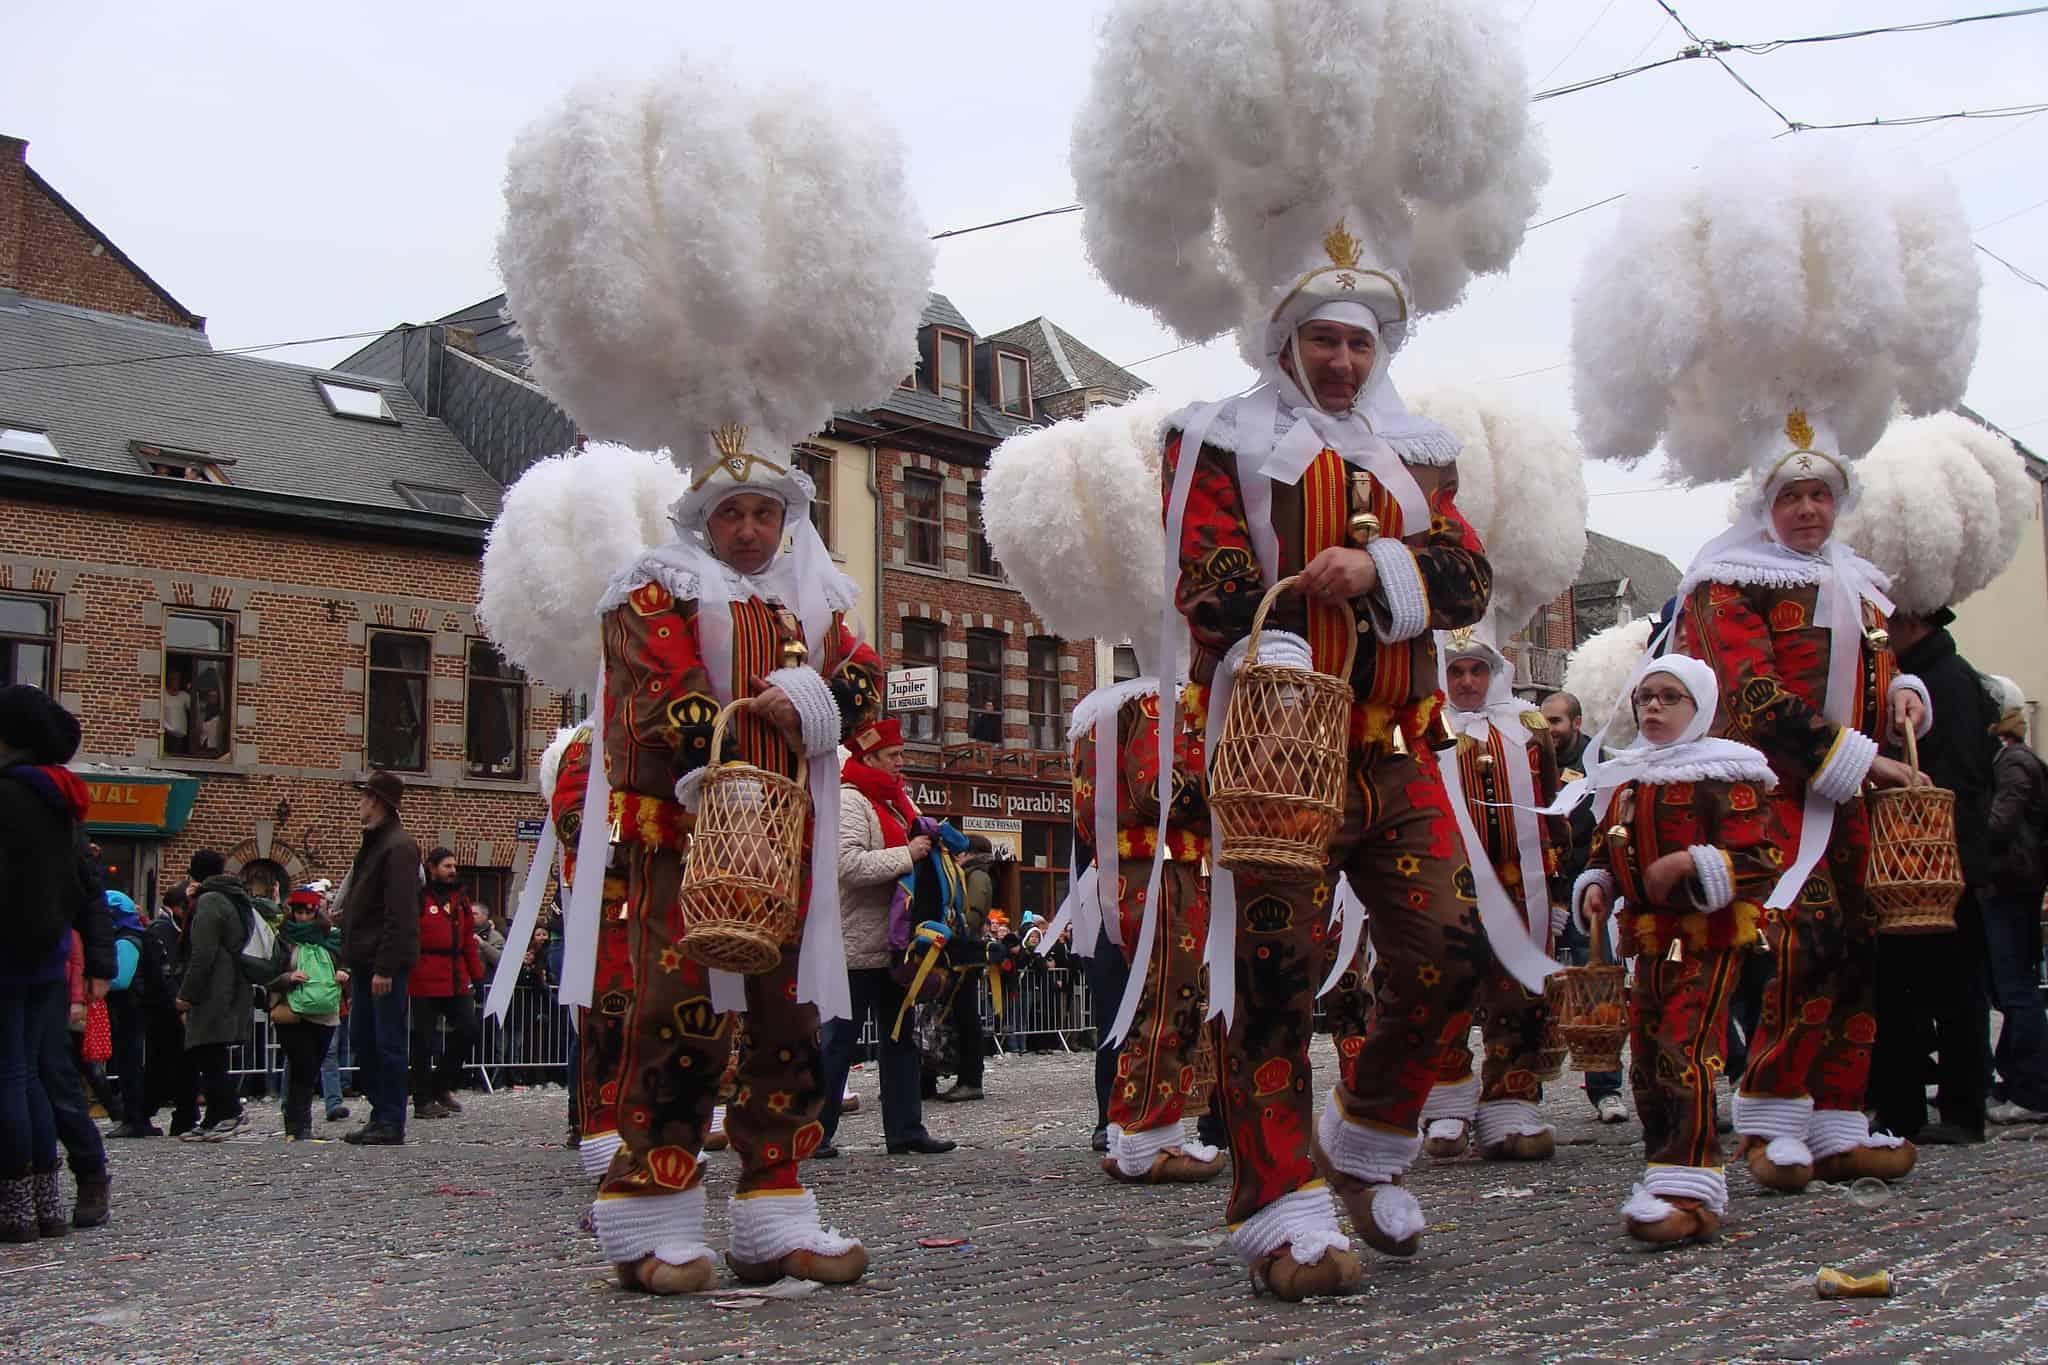 Carnival of Binche, Belgium Facts